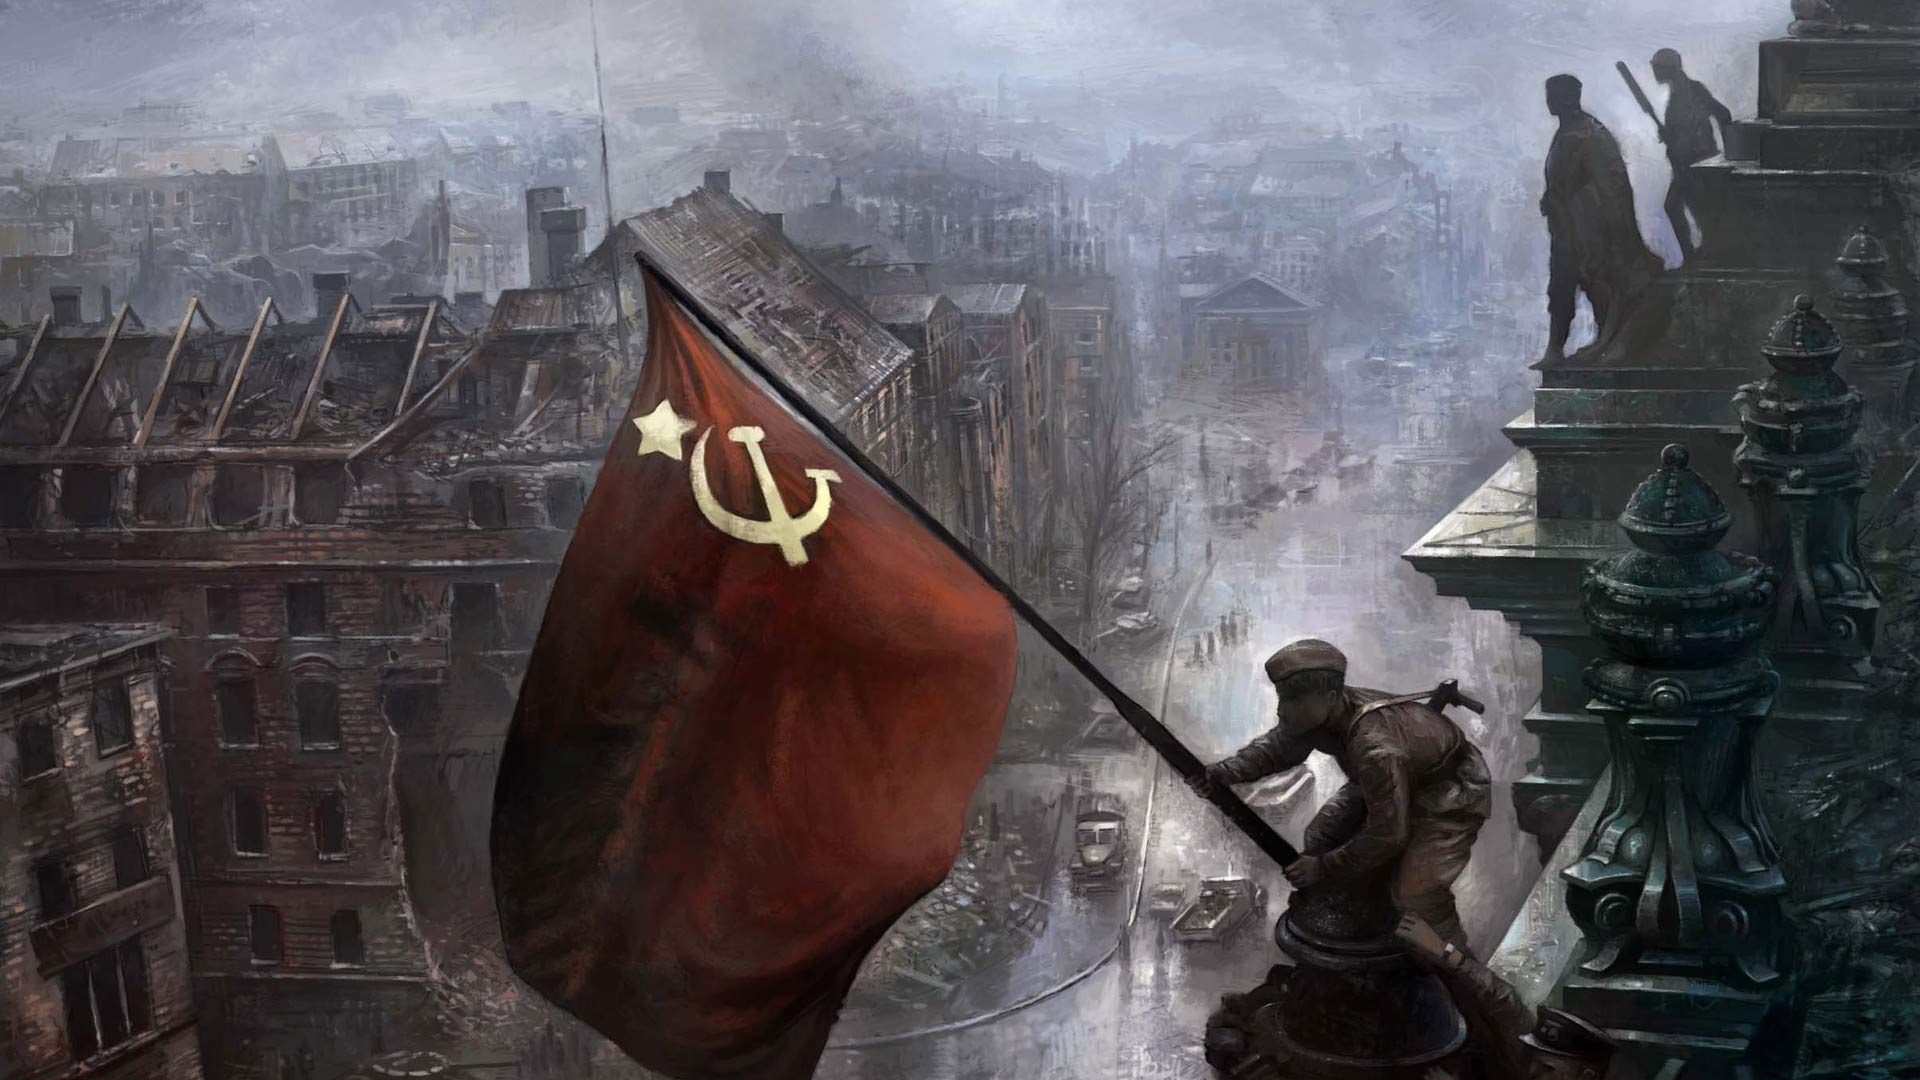 День победы. Знамя над рейхстагом